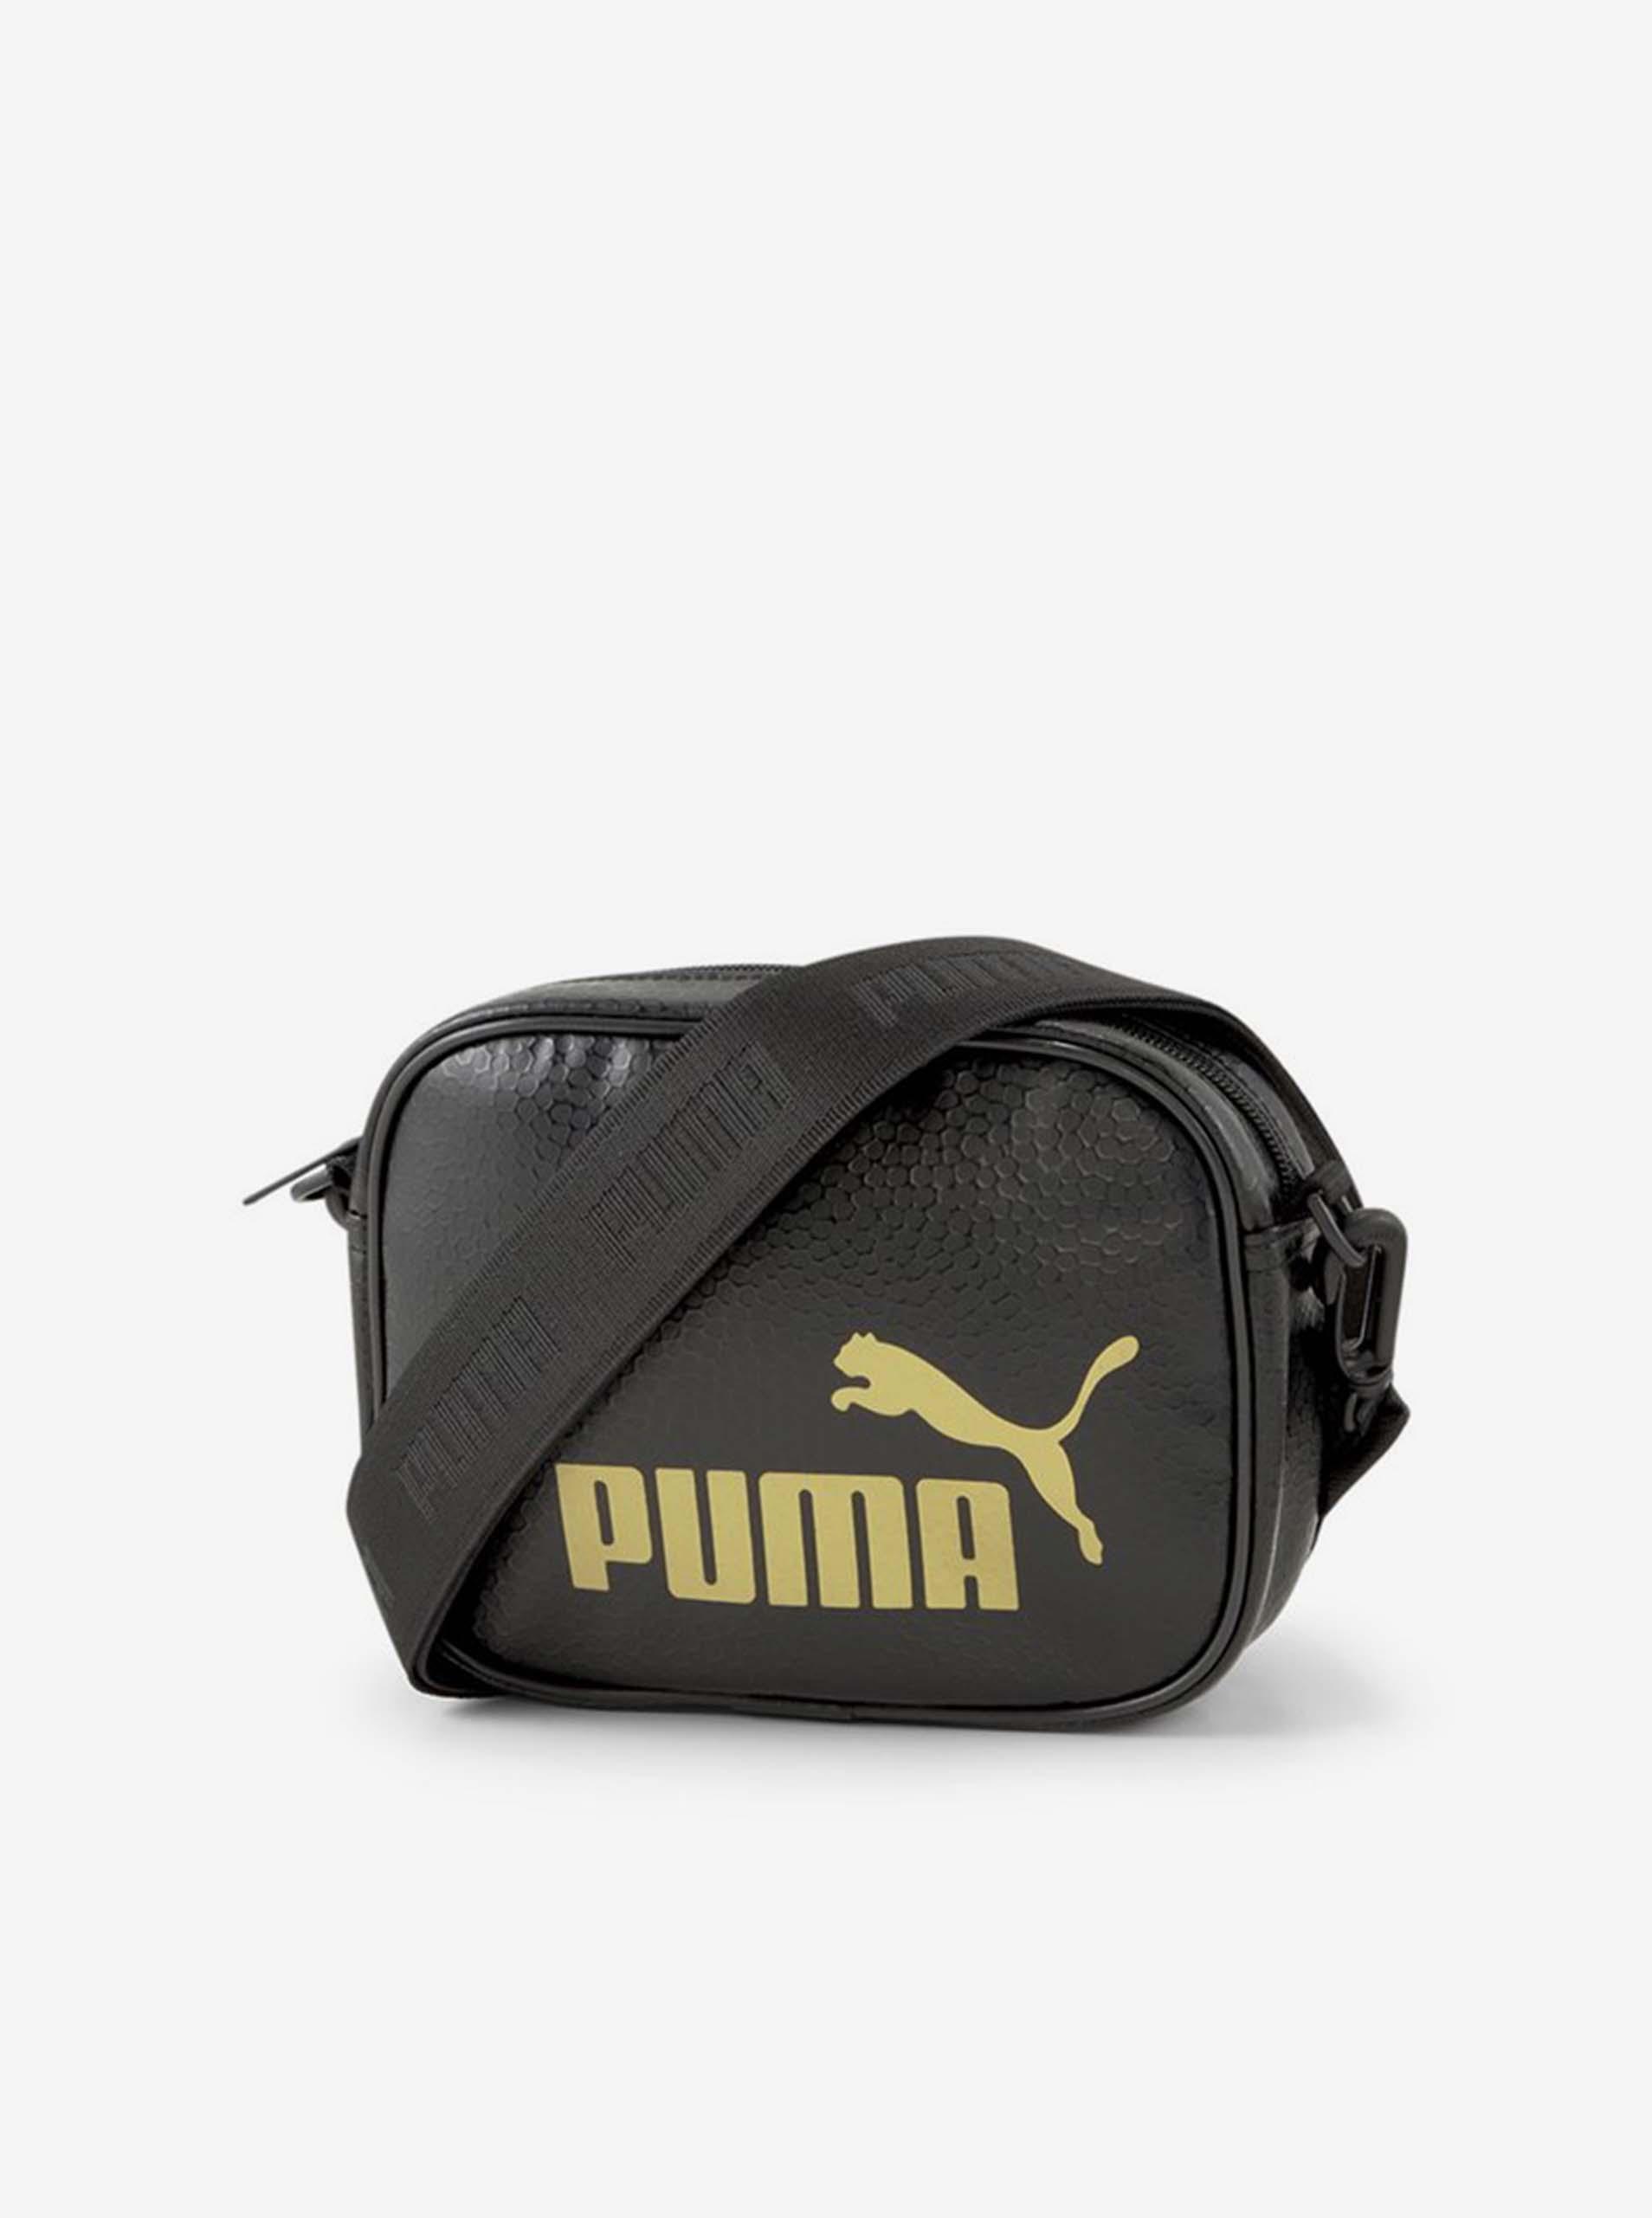 Puma Women's bag black